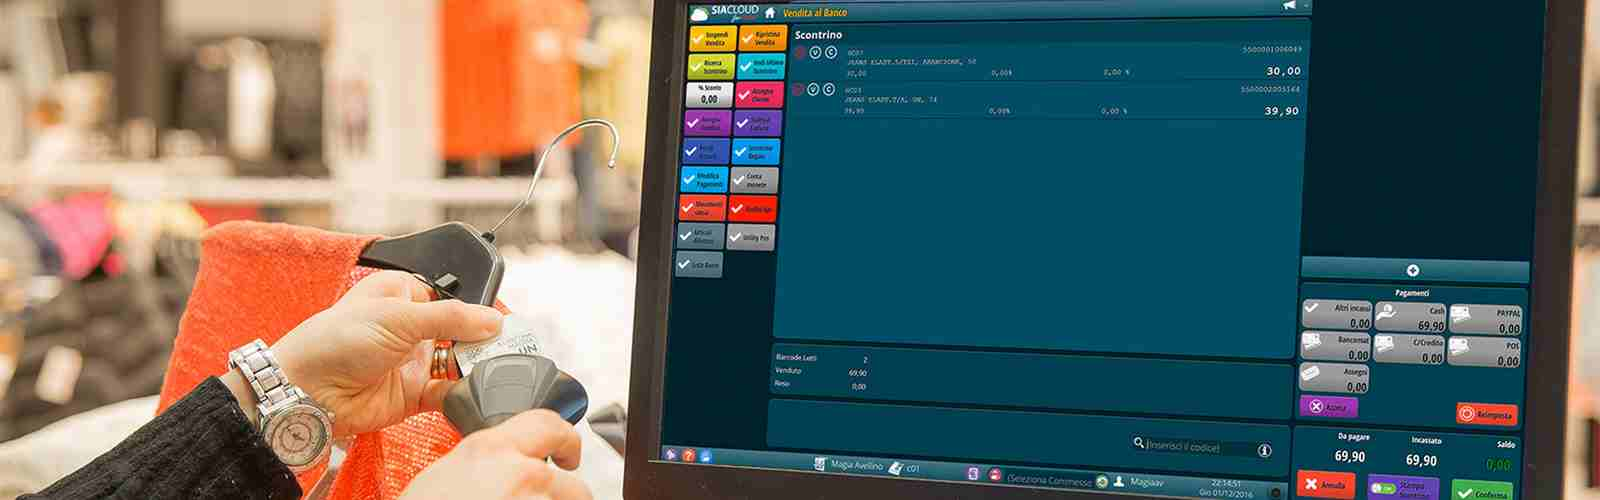 software gestionale retail - tim digital store - vendita al dettaglio - SIACLOUD